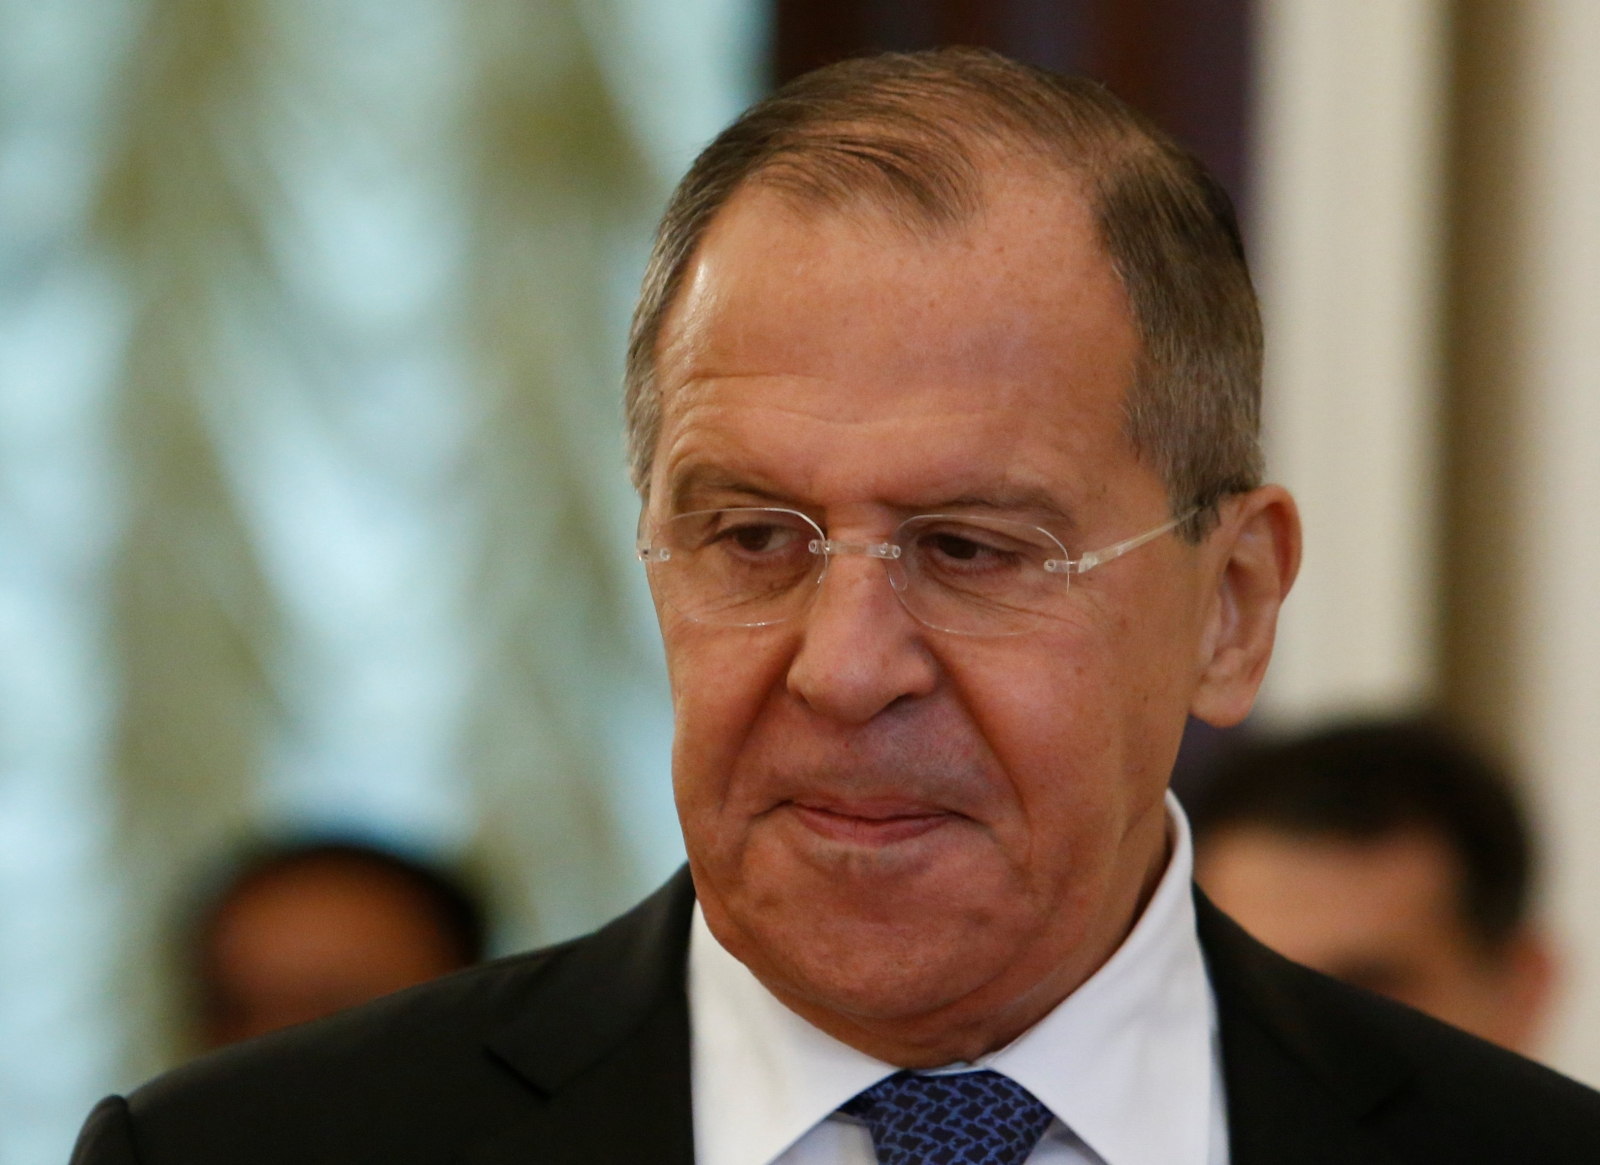 russia-not-100-sure-abu-bakr-al-baghdad-is-dead